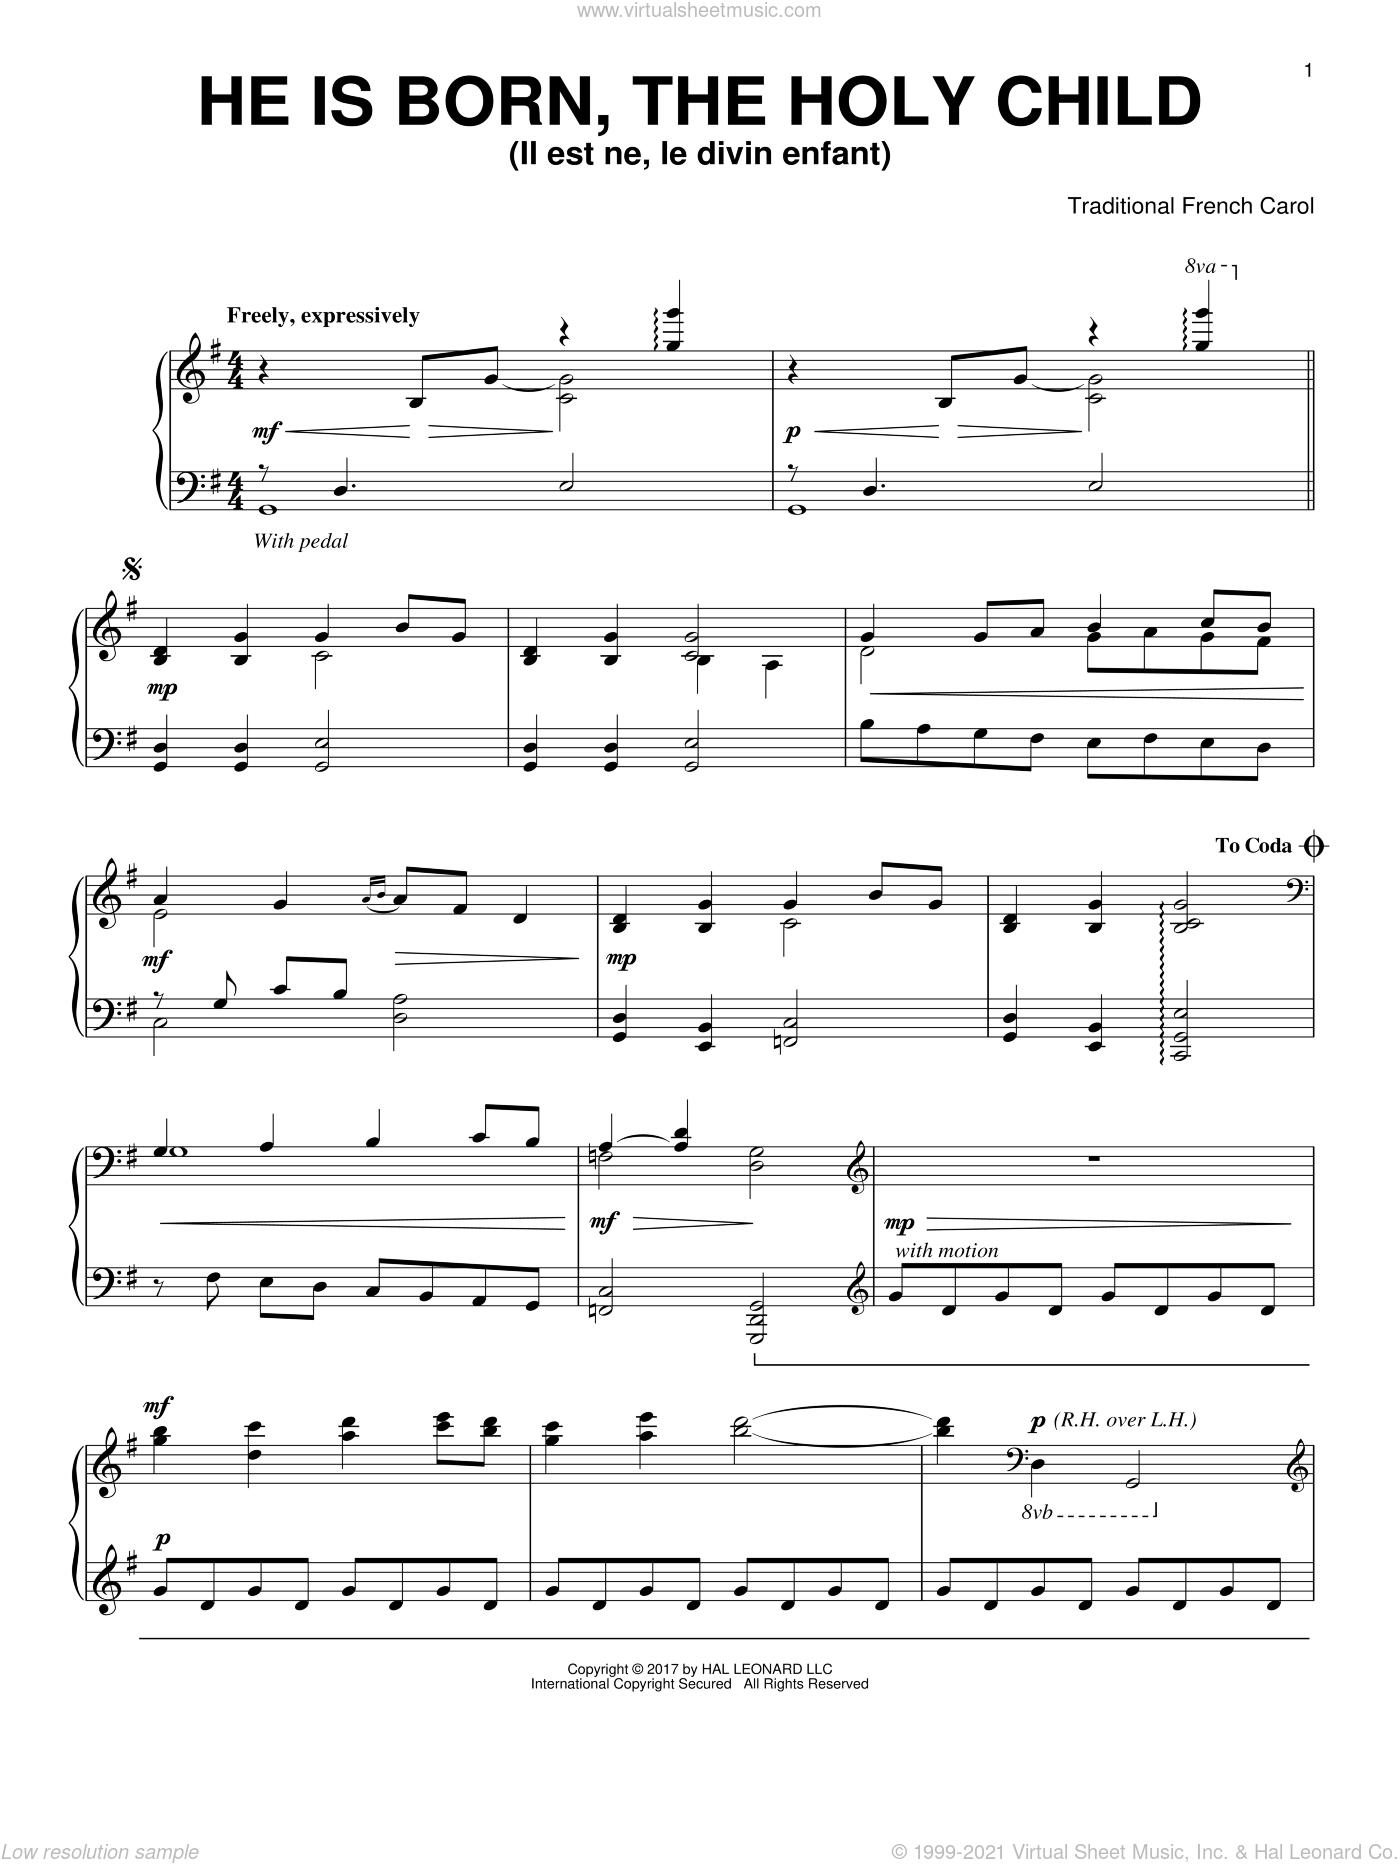 He Is Born, The Holy Child (Il Est Ne, Le Divin Enfant) sheet music for piano solo, intermediate skill level